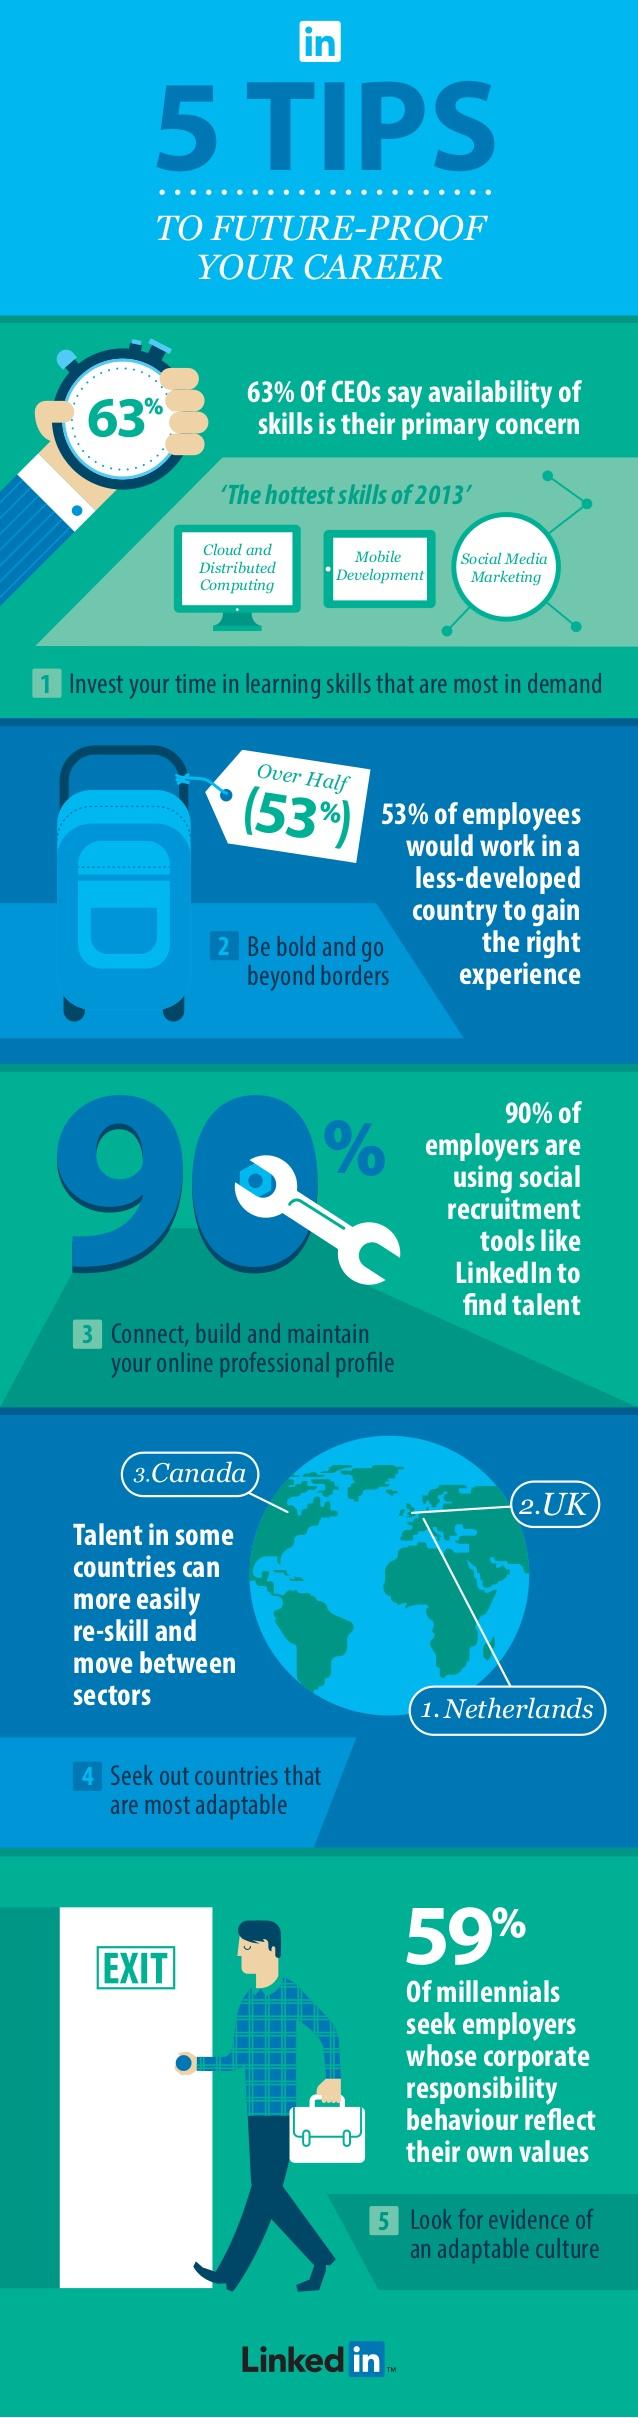 Vijf LinkedIn carriere tips